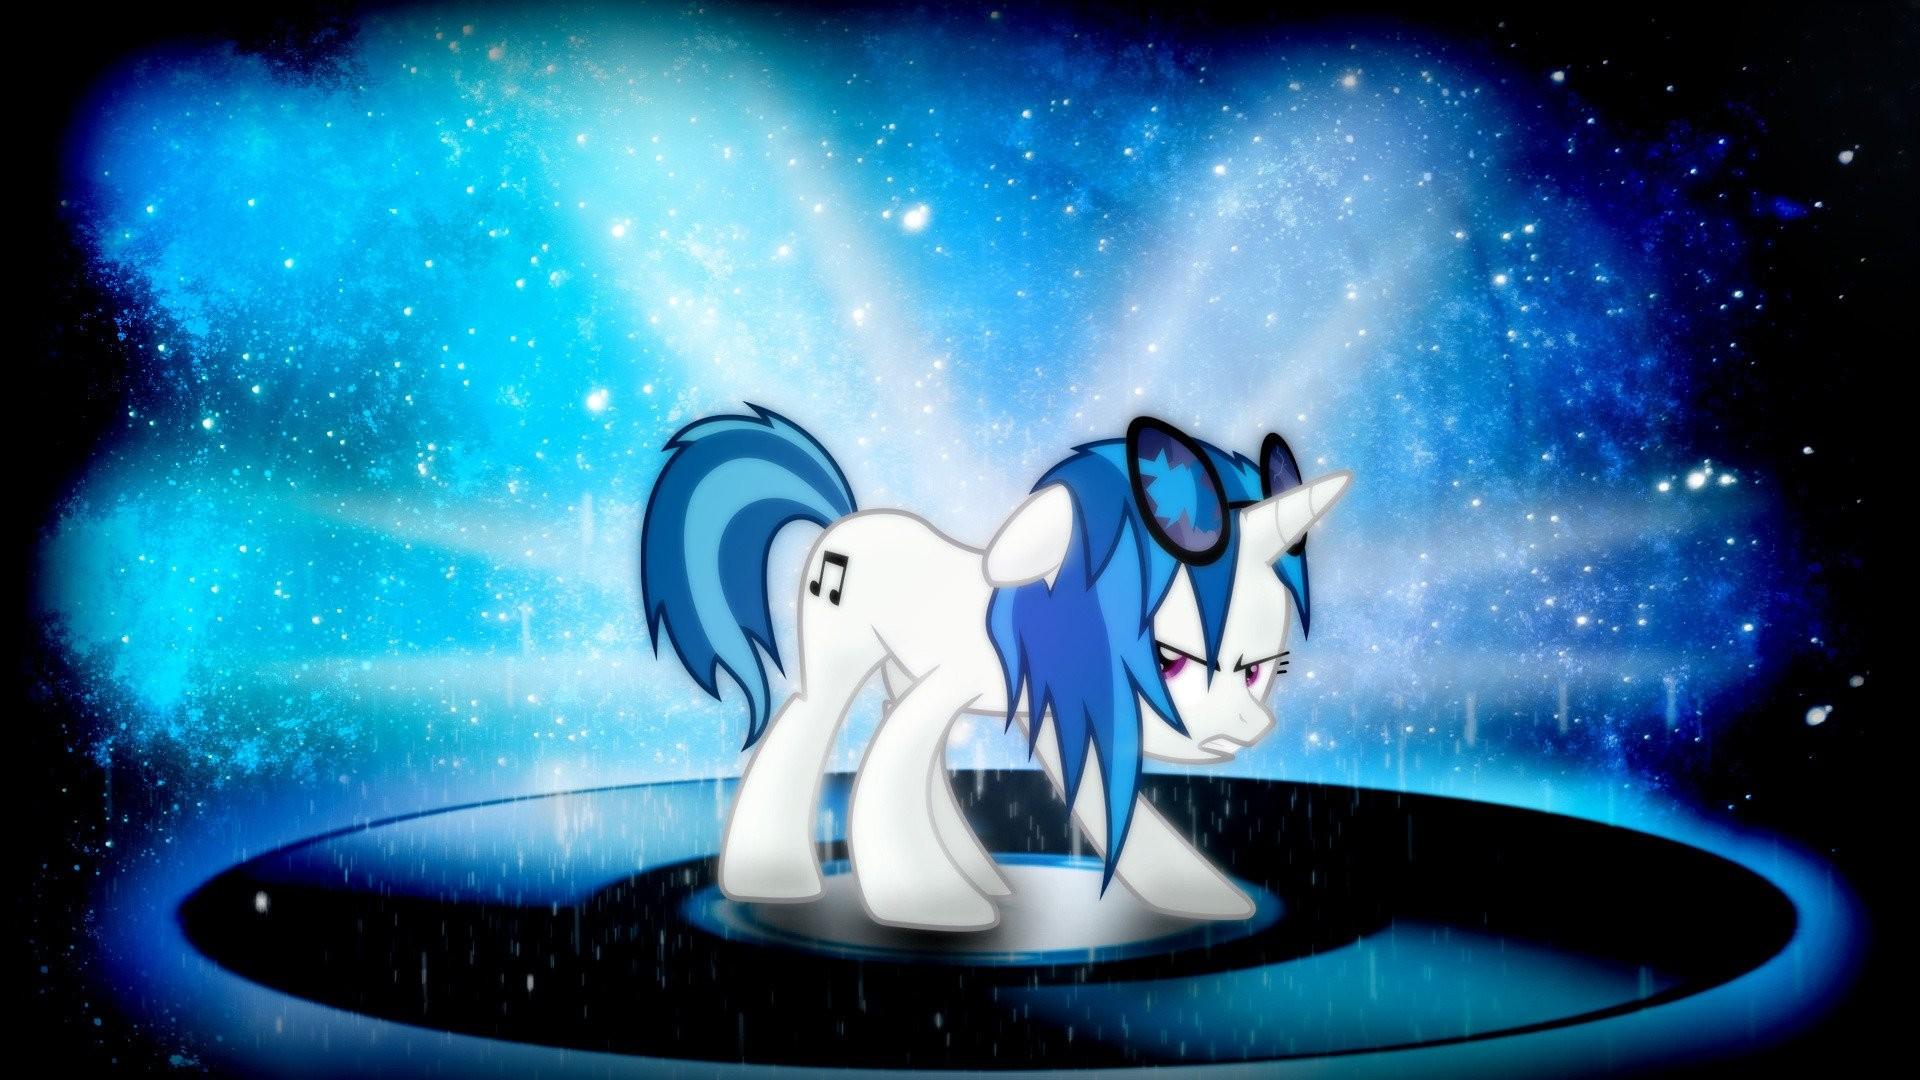 my little pony vinyl scratch iphone wallpaper ·①